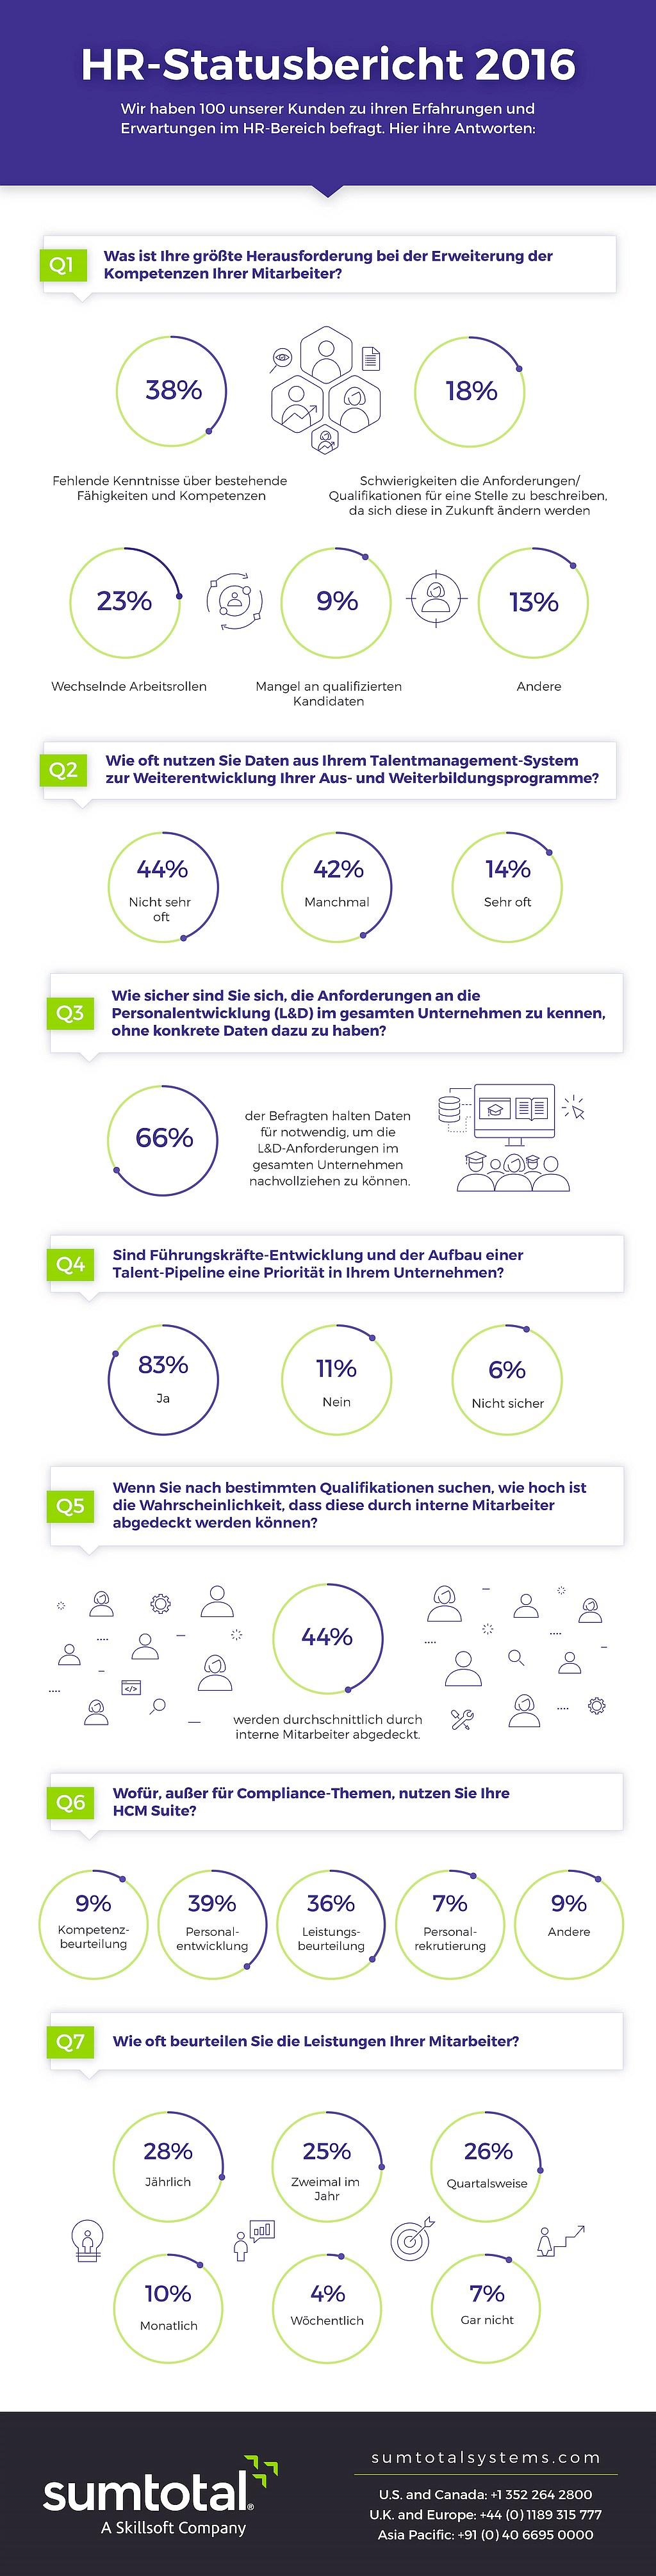 infografik-sumtotal-entwicklung-personal